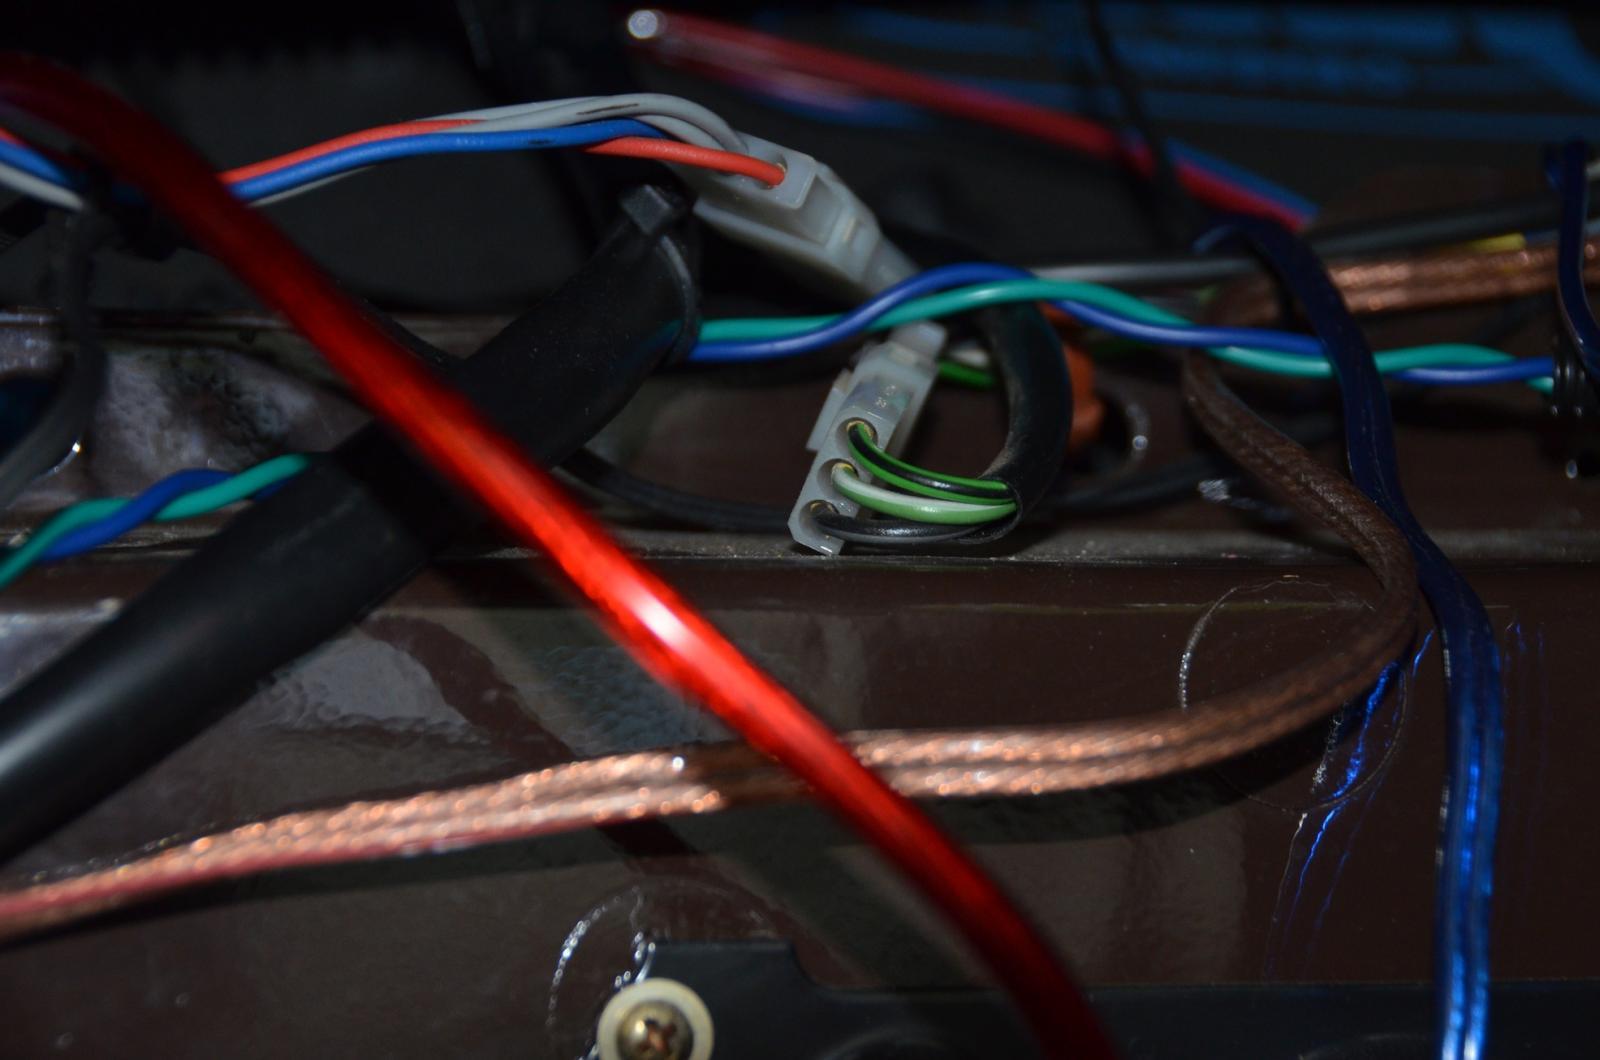 wire & connectors behind glove box